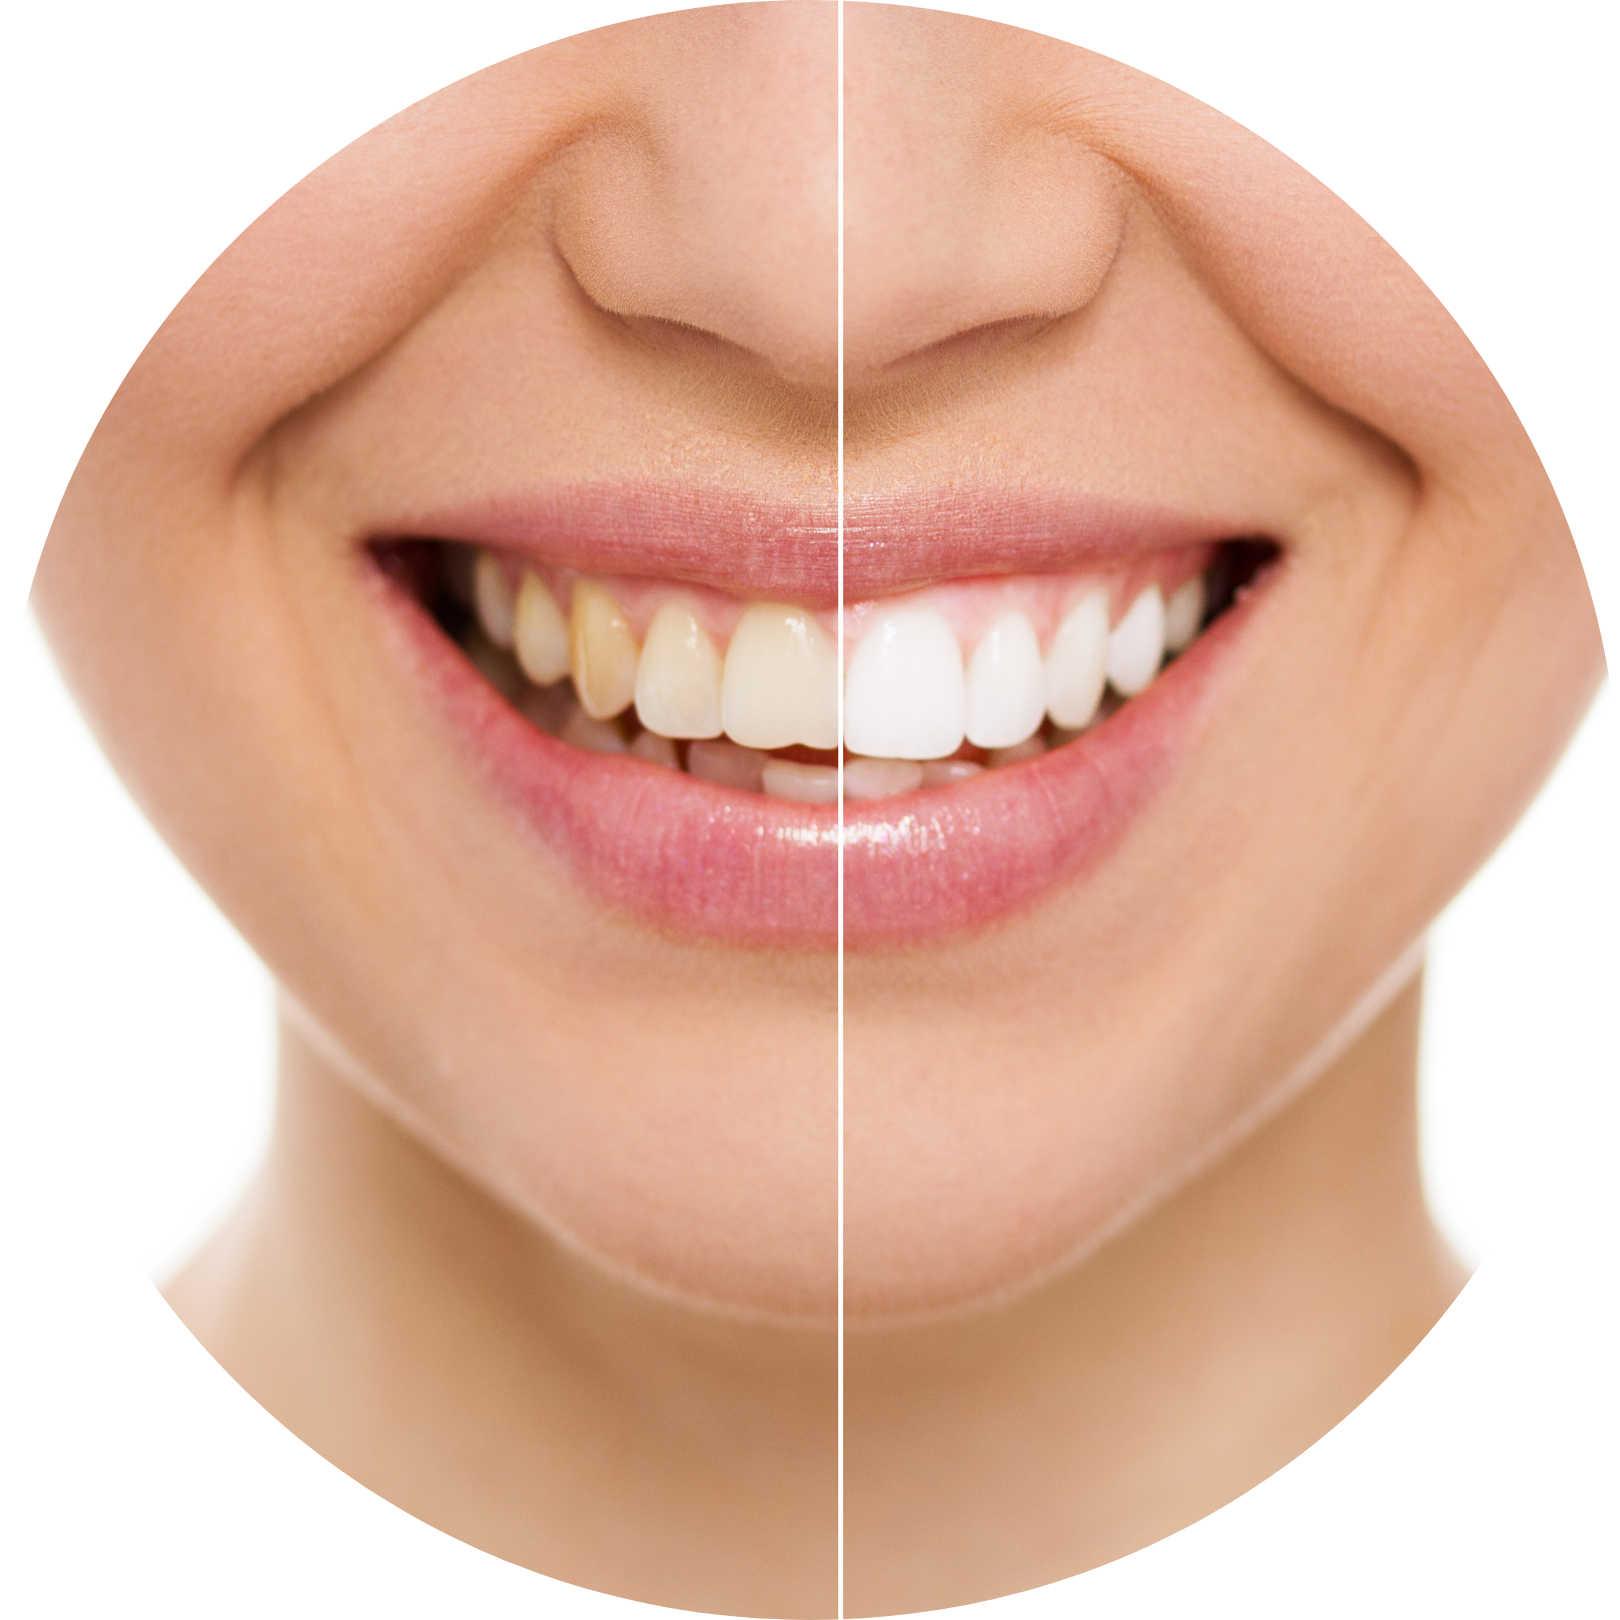 teeth-whitening-st-clair-dentist